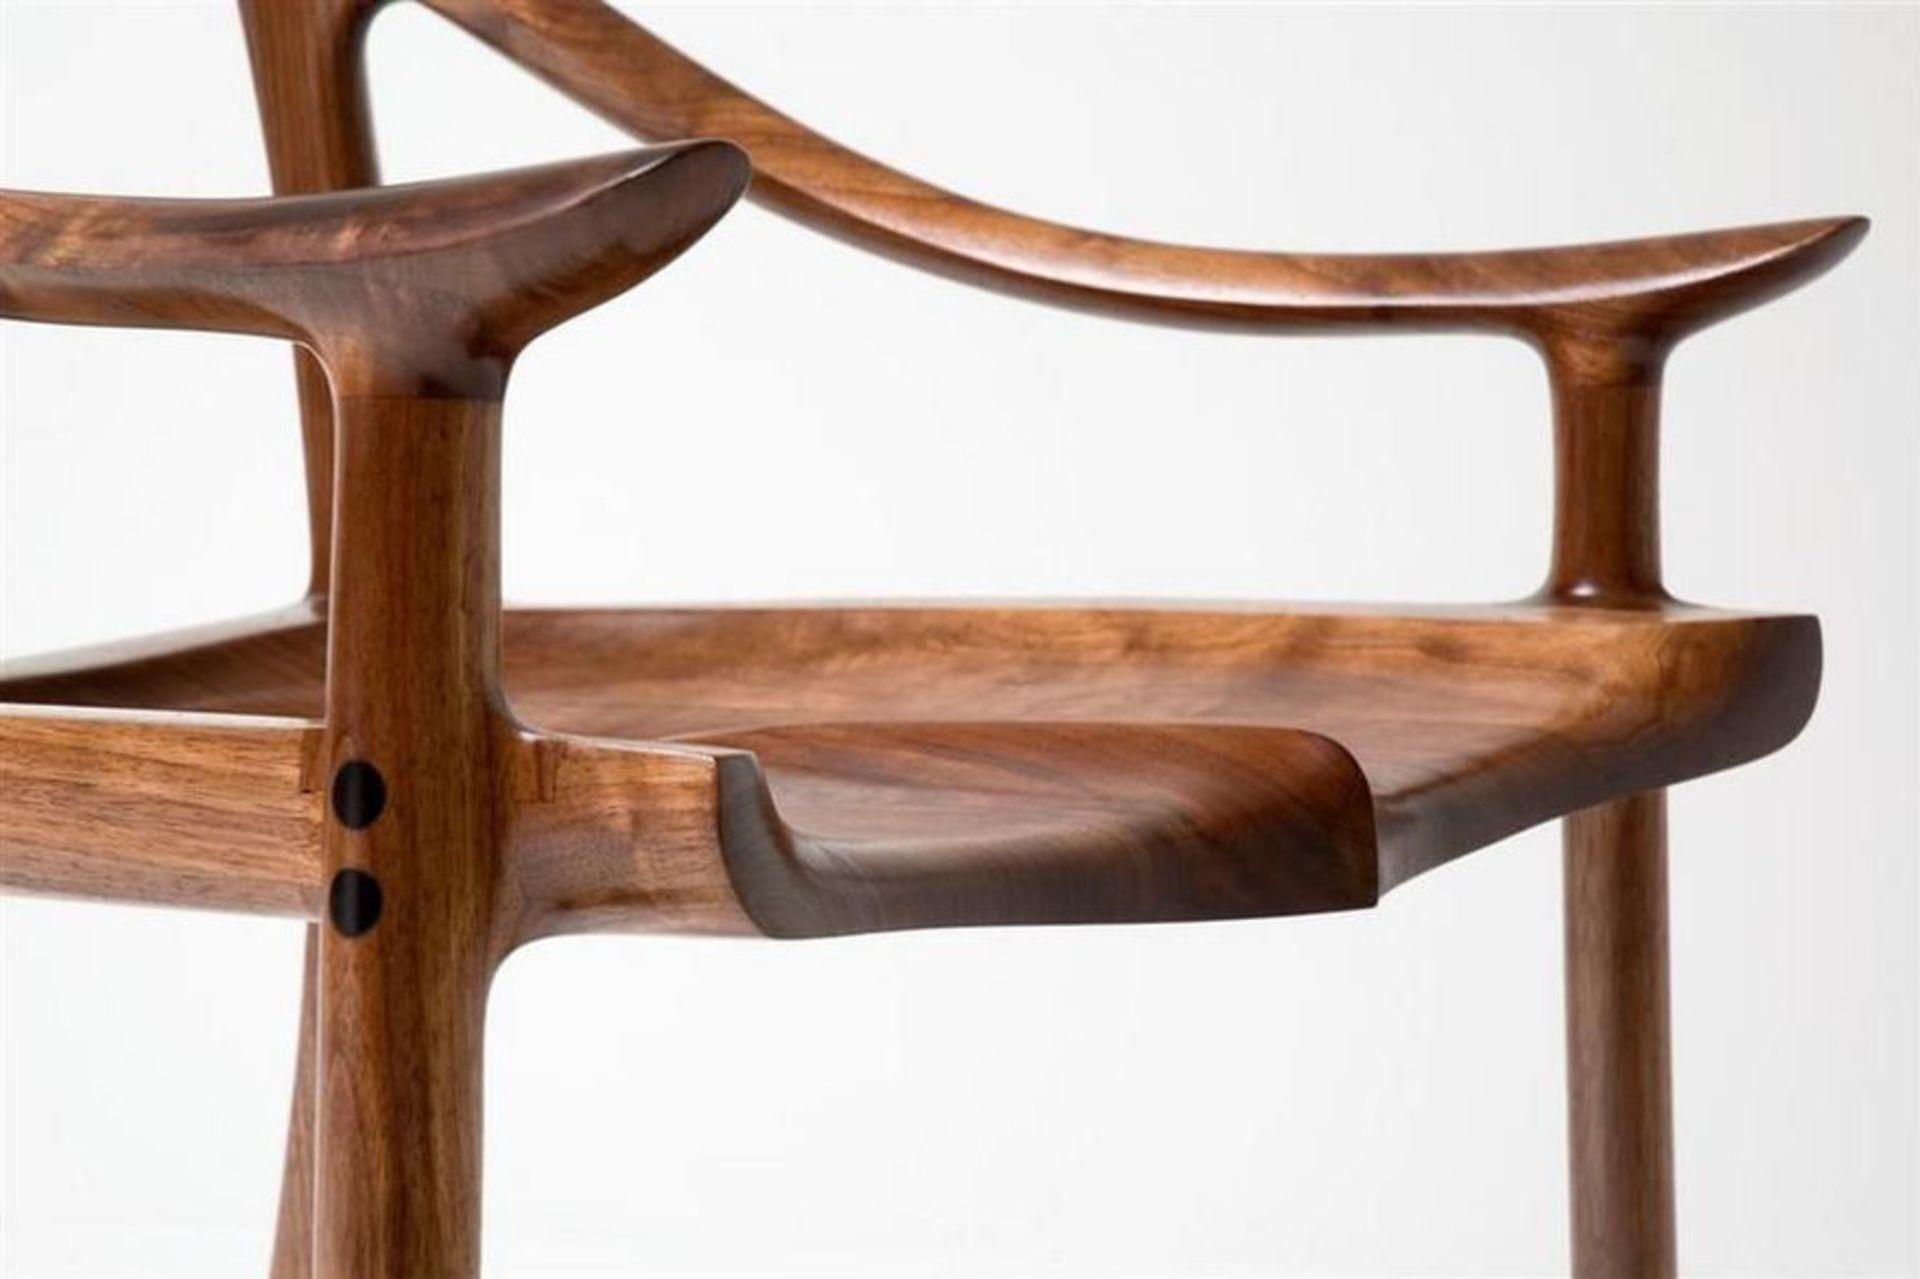 Rethinking Chair Comfort